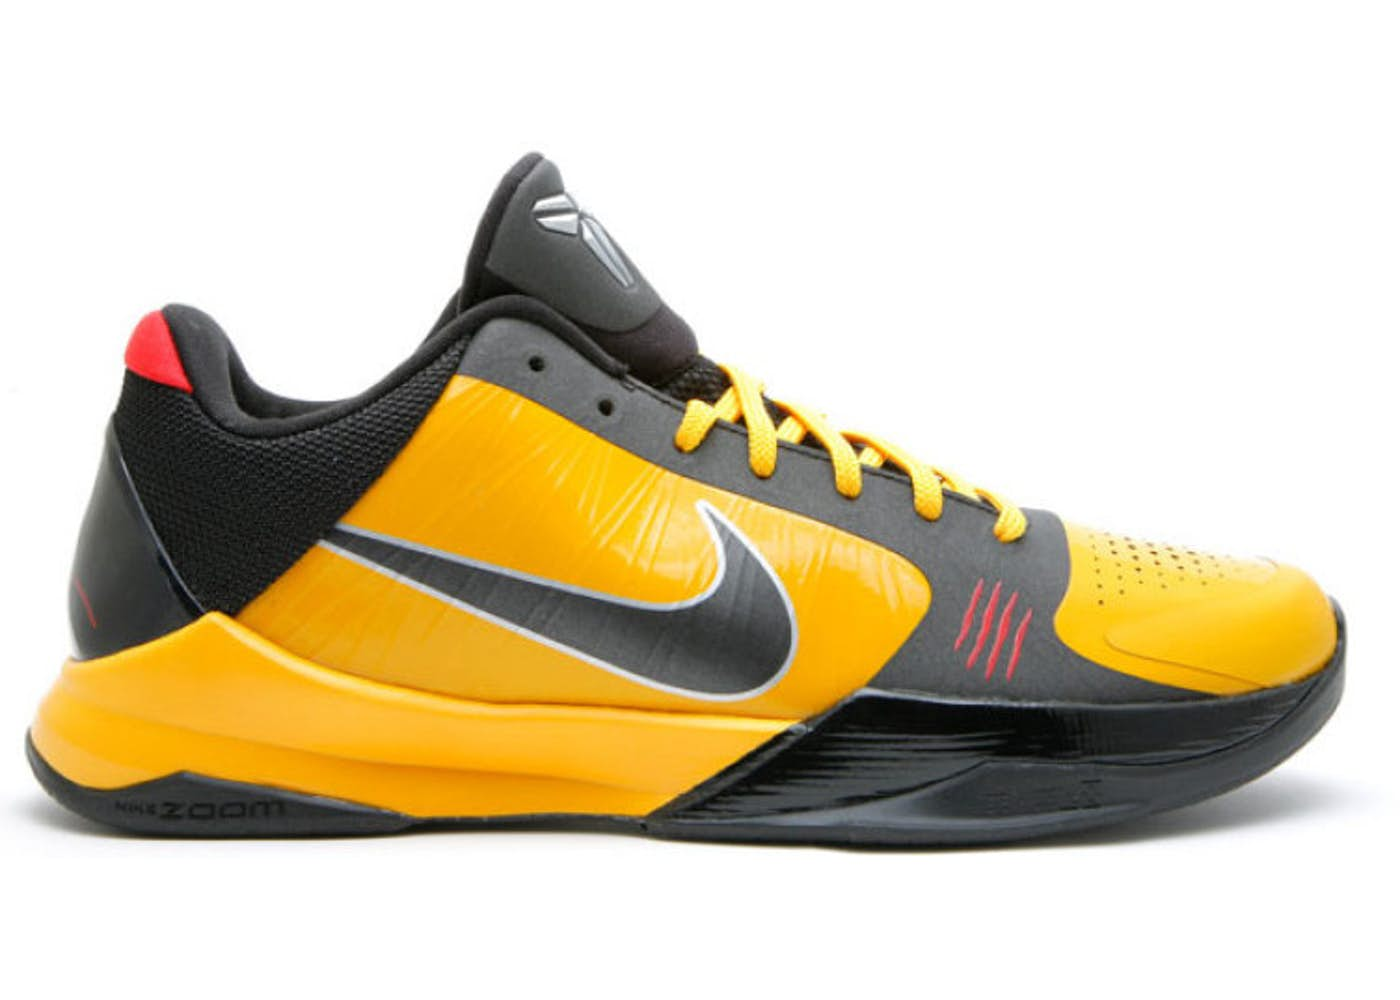 Kobe Bruce Lee Shoes Price